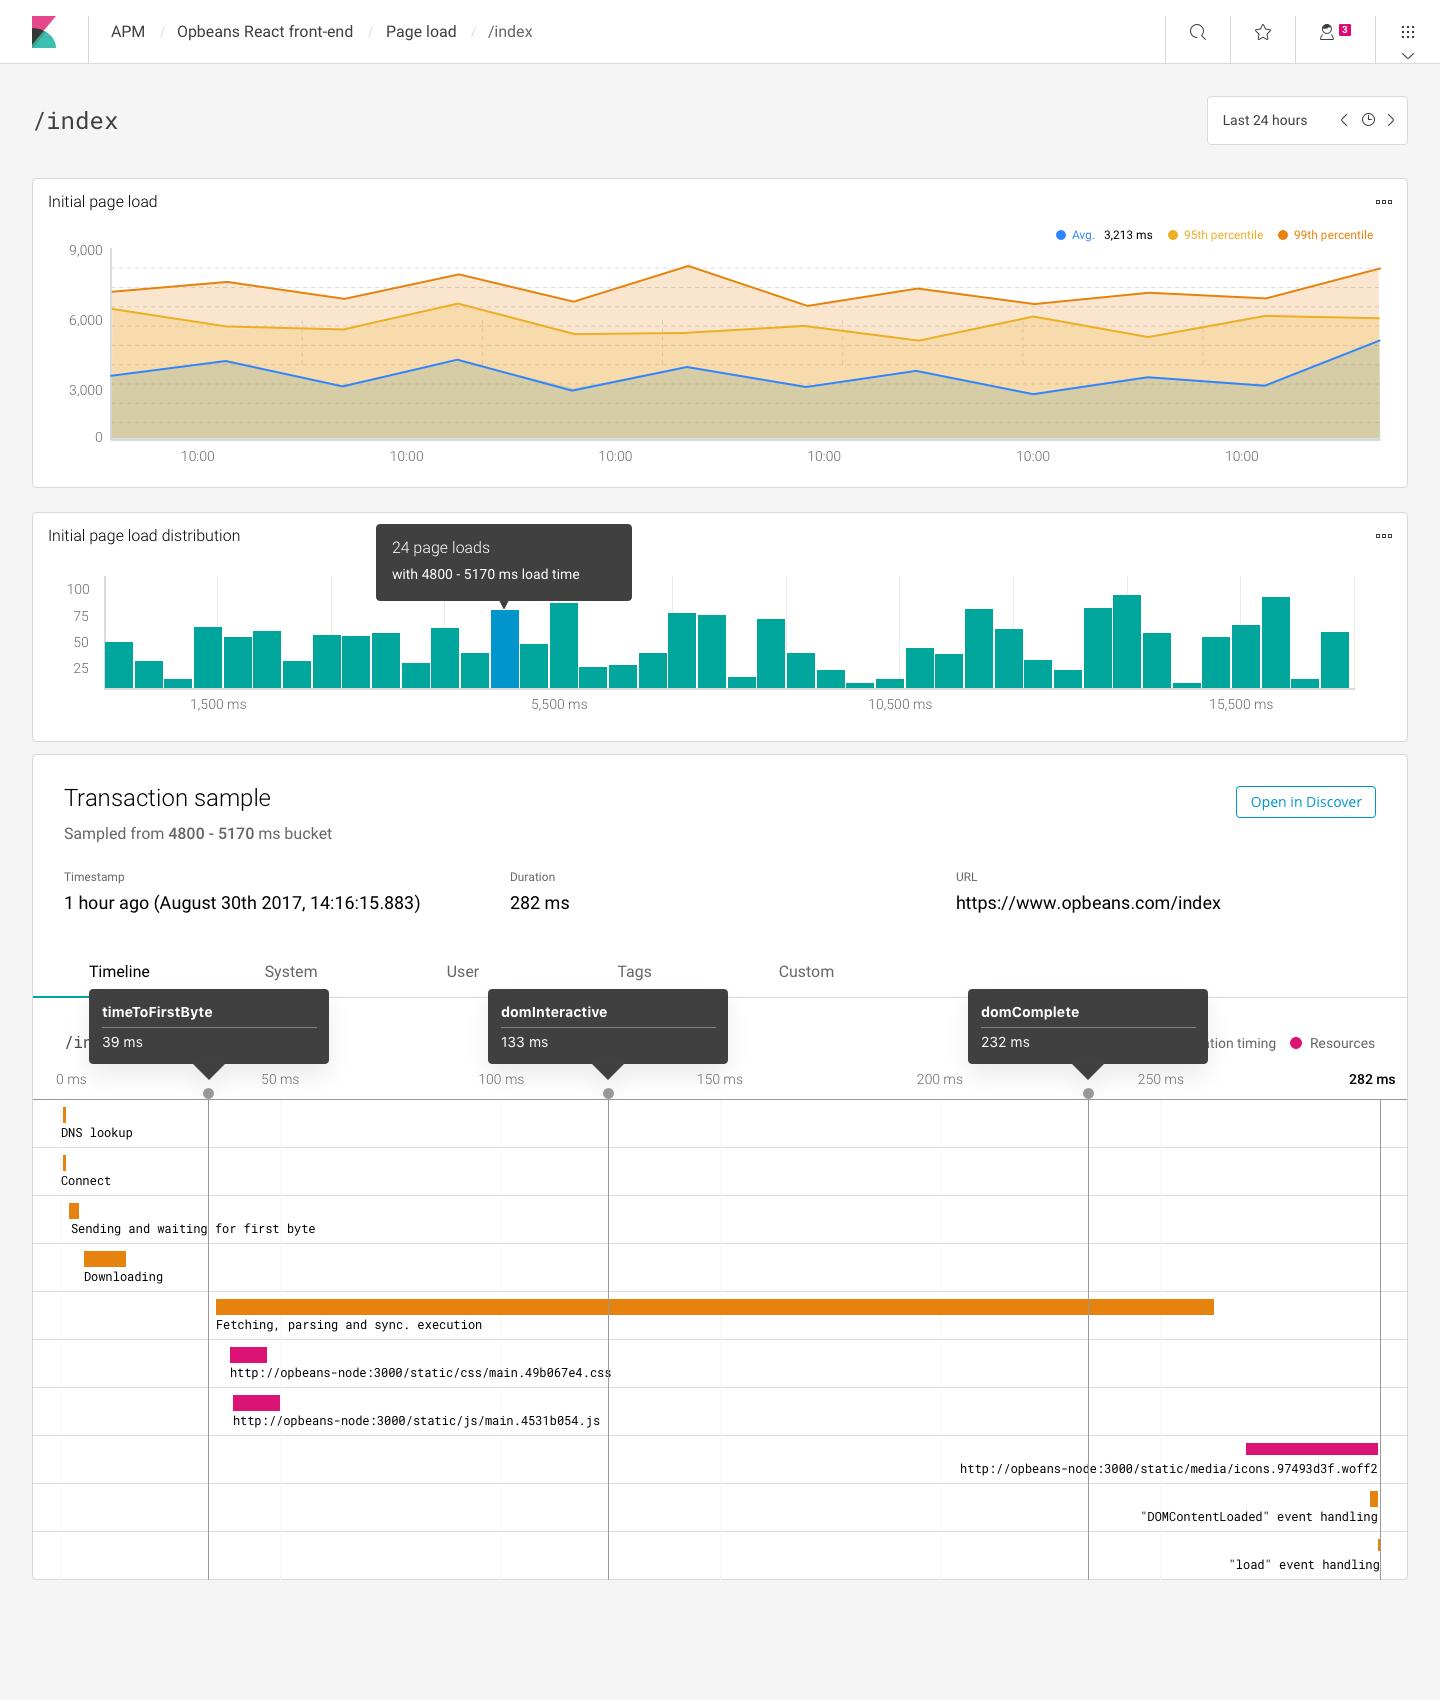 apm transaction sample timeline show timeline annotations for